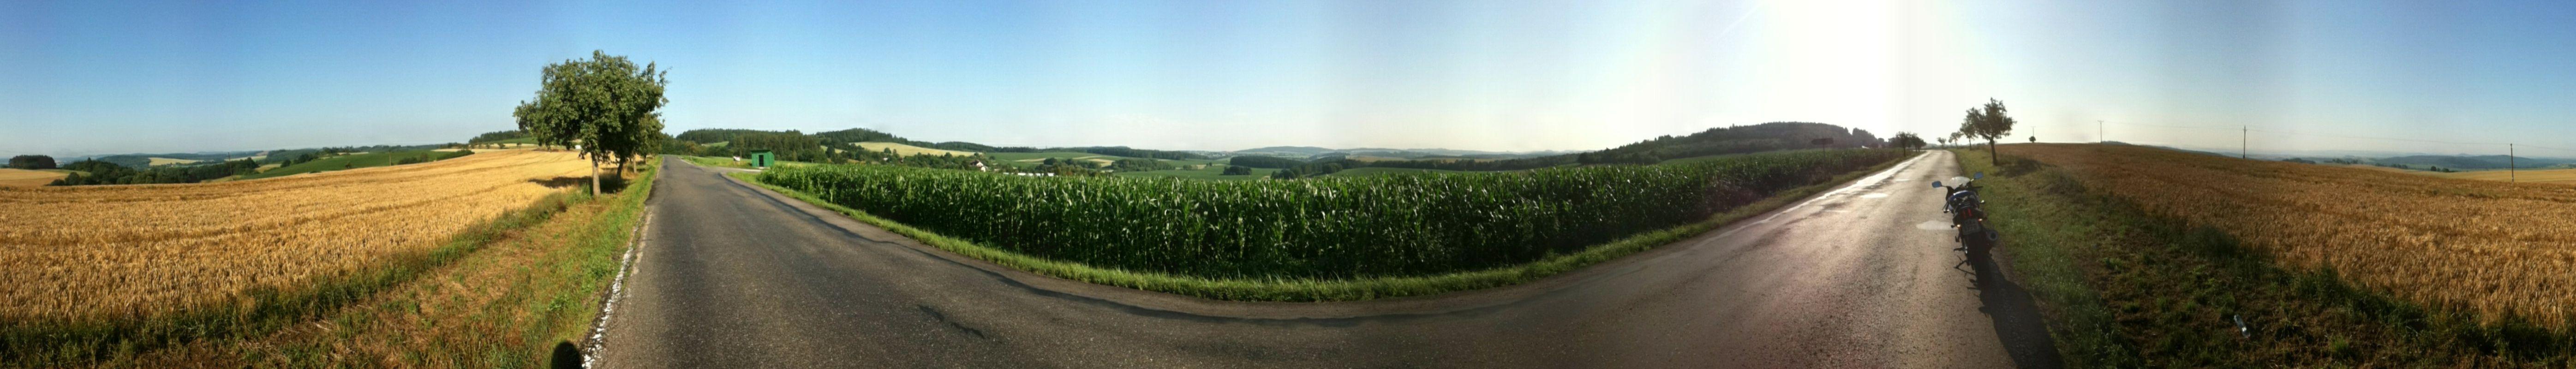 My first longer trip (about 90km) Jul 2012